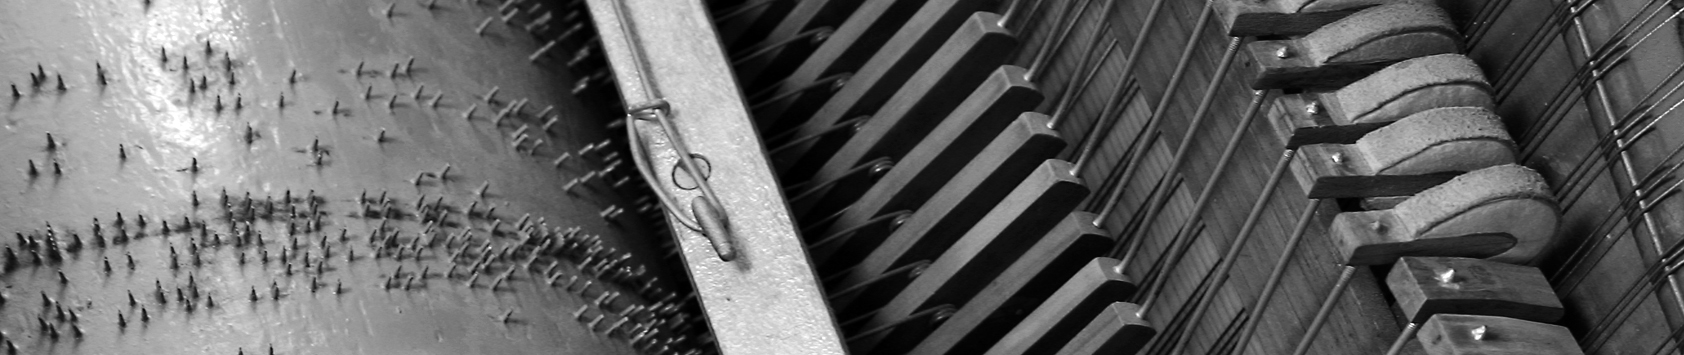 cima-piano-mecanique_detail-nb